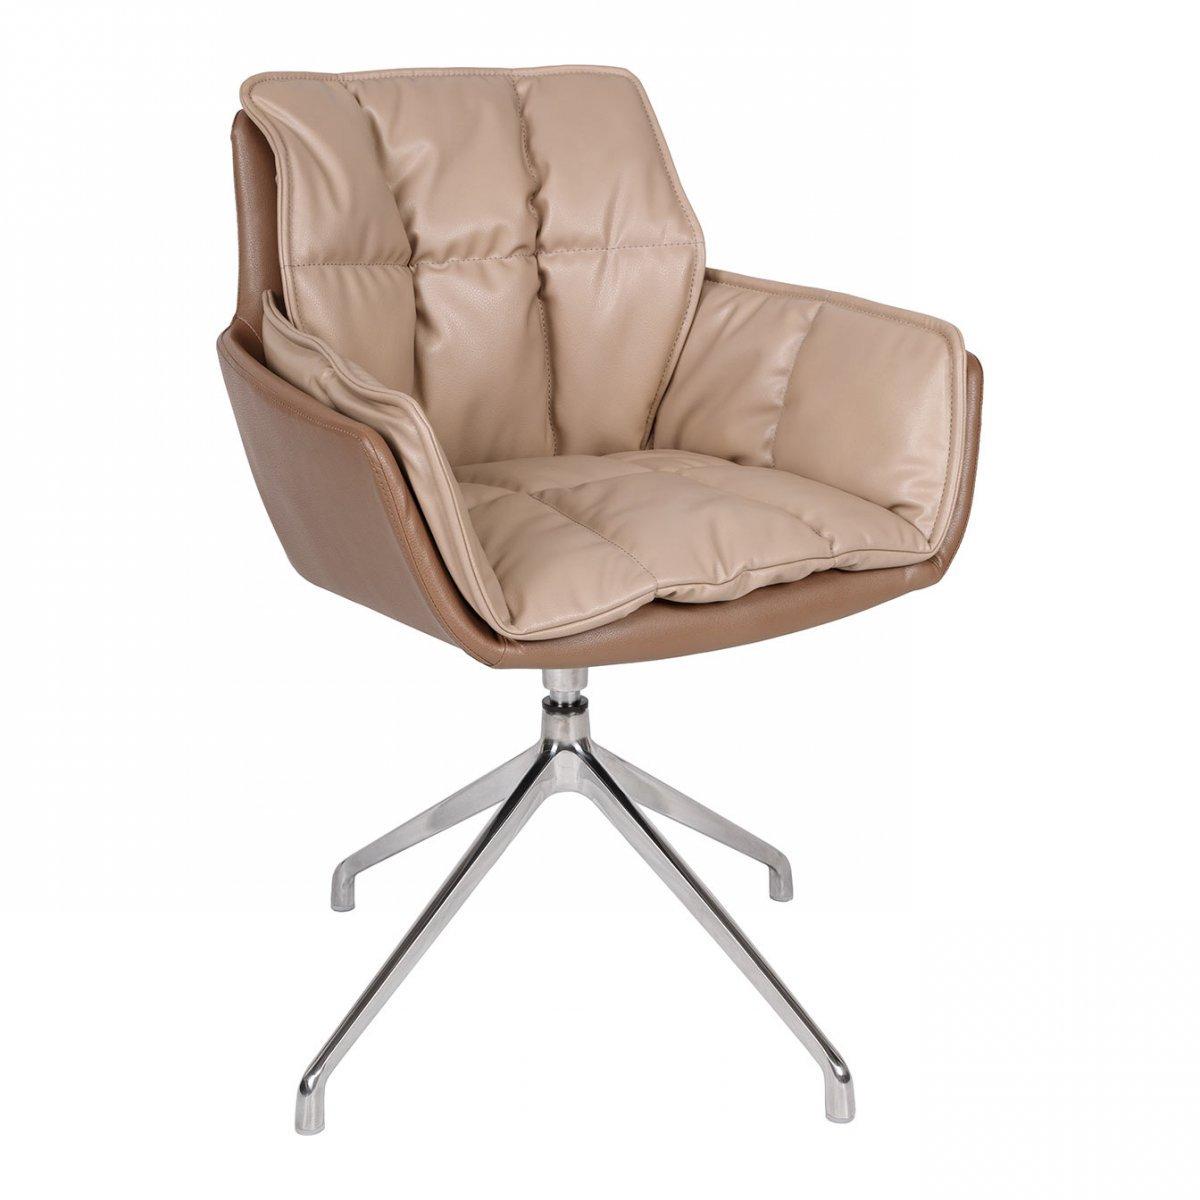 Фото - Кресло поворотное PALMA экокожа